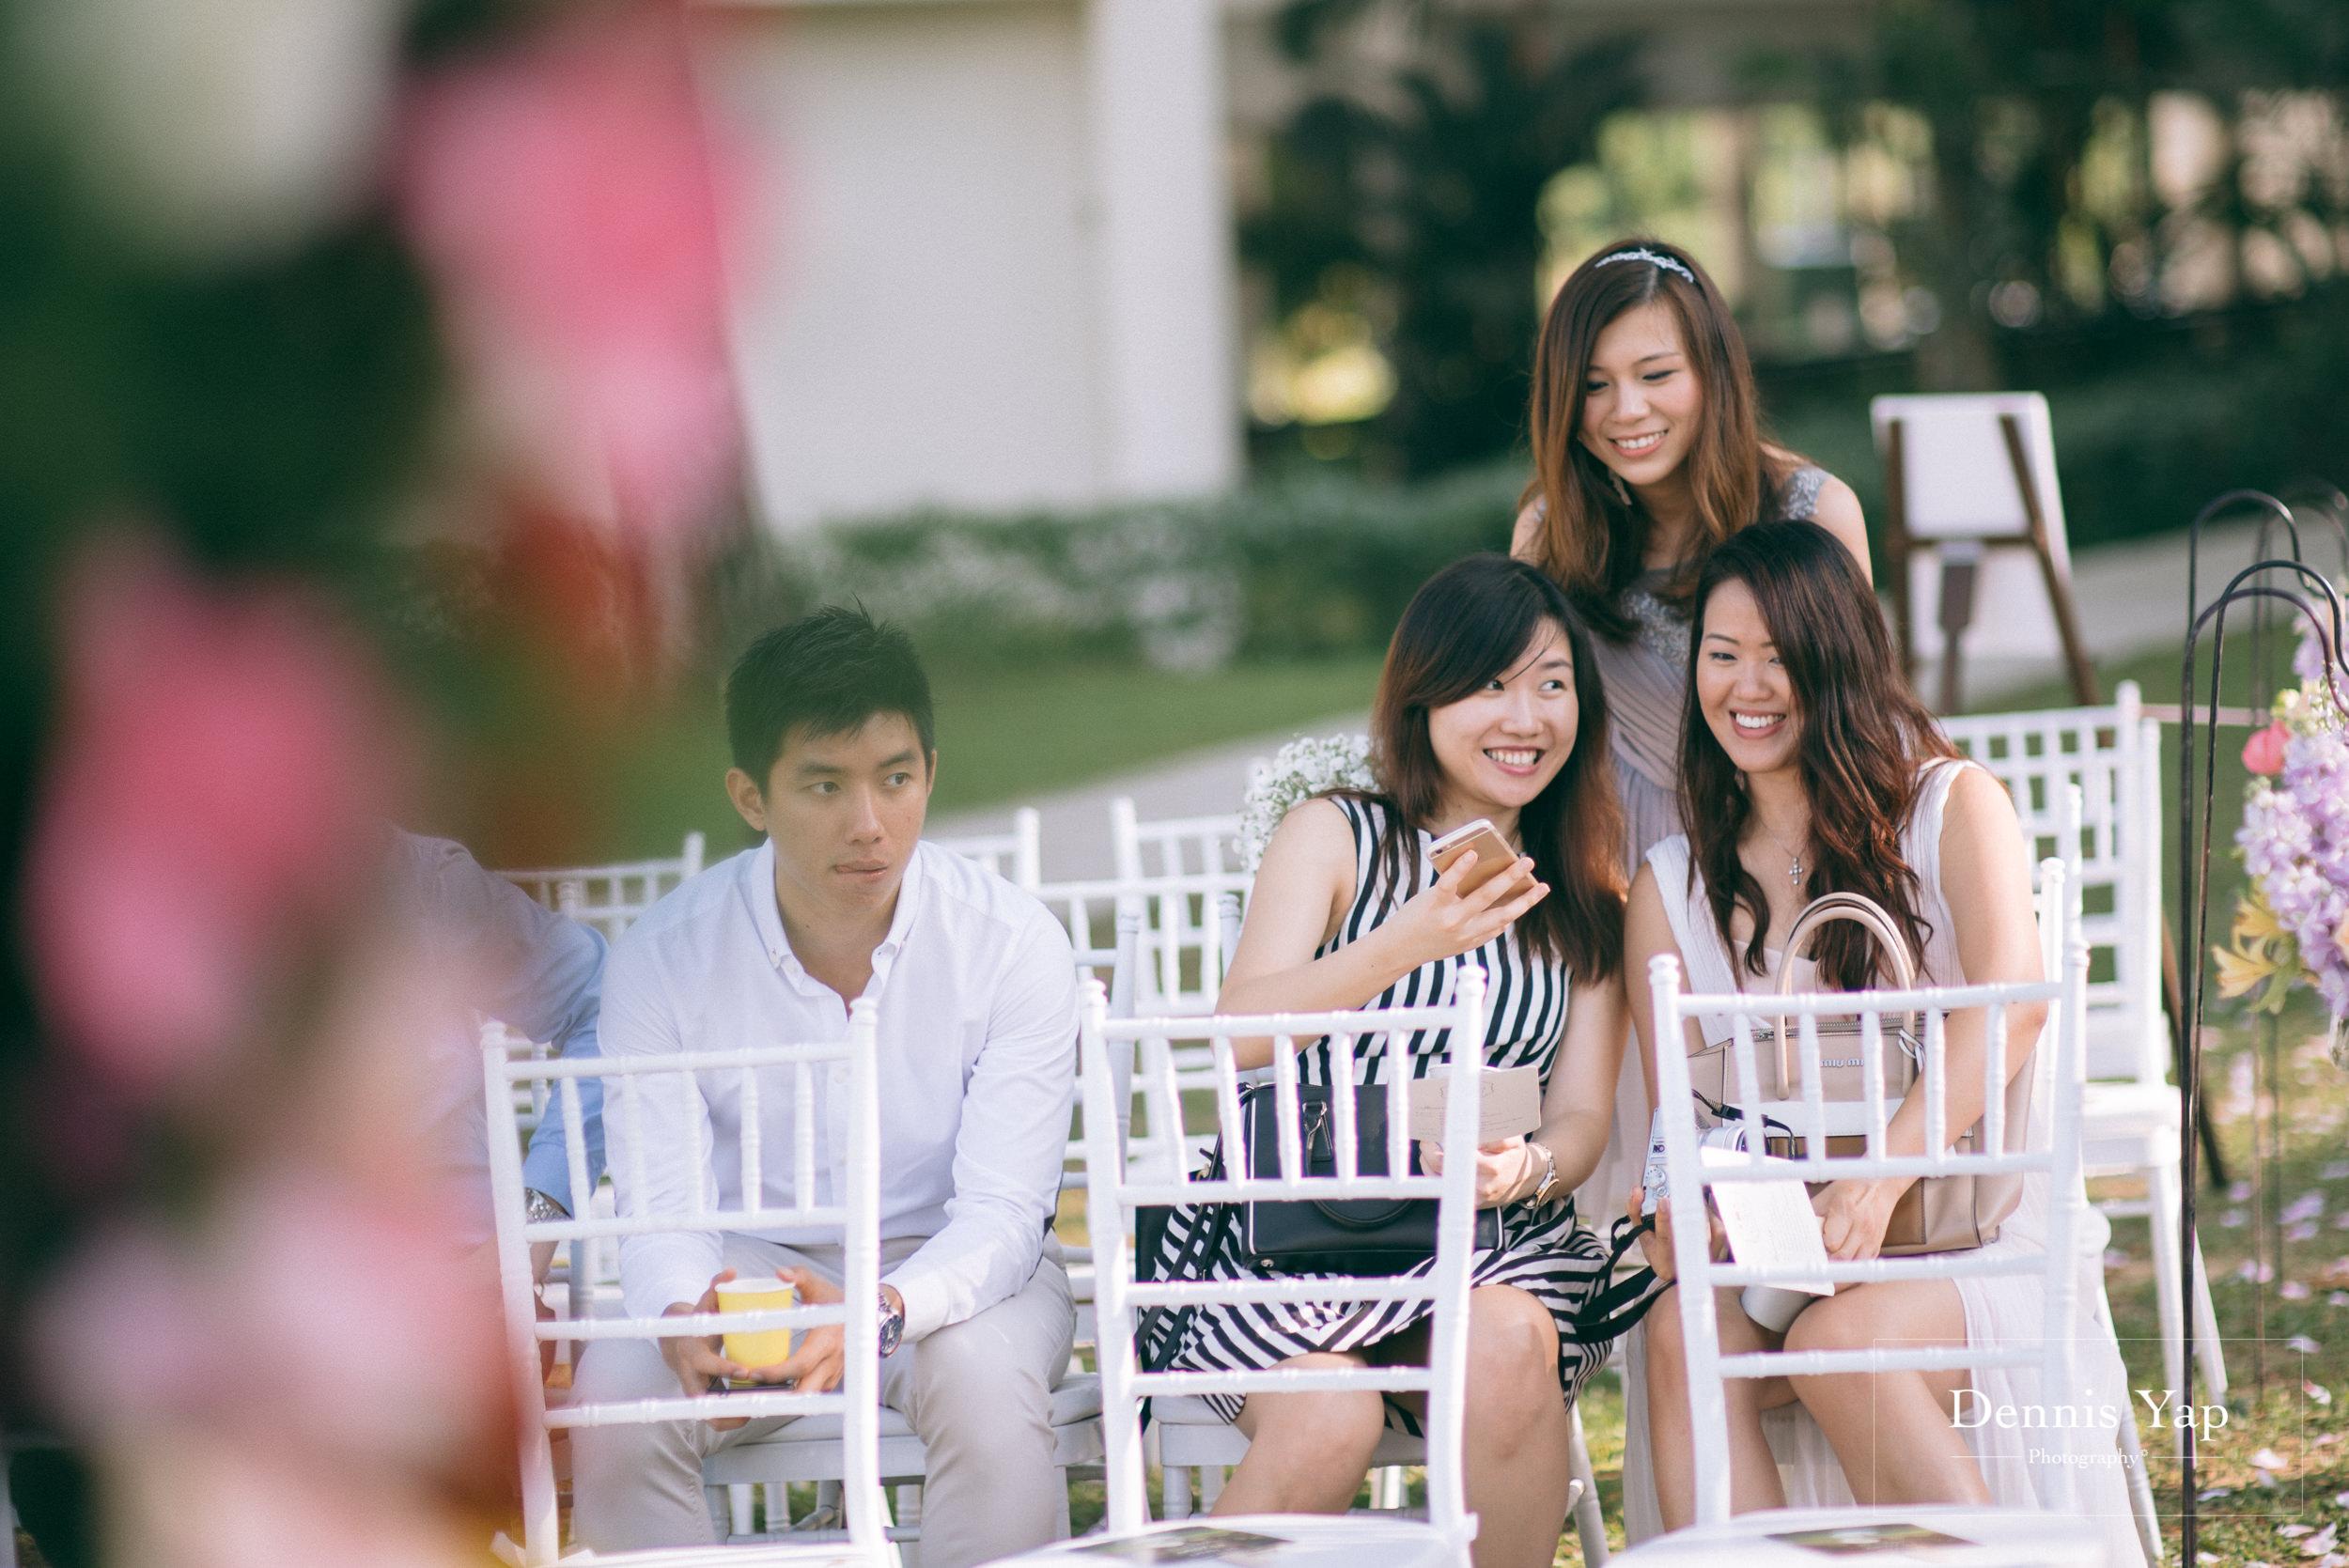 taylai cheng yee garden wedding saujana hotel subang jaya dennis yap photography sunlight-10.jpg